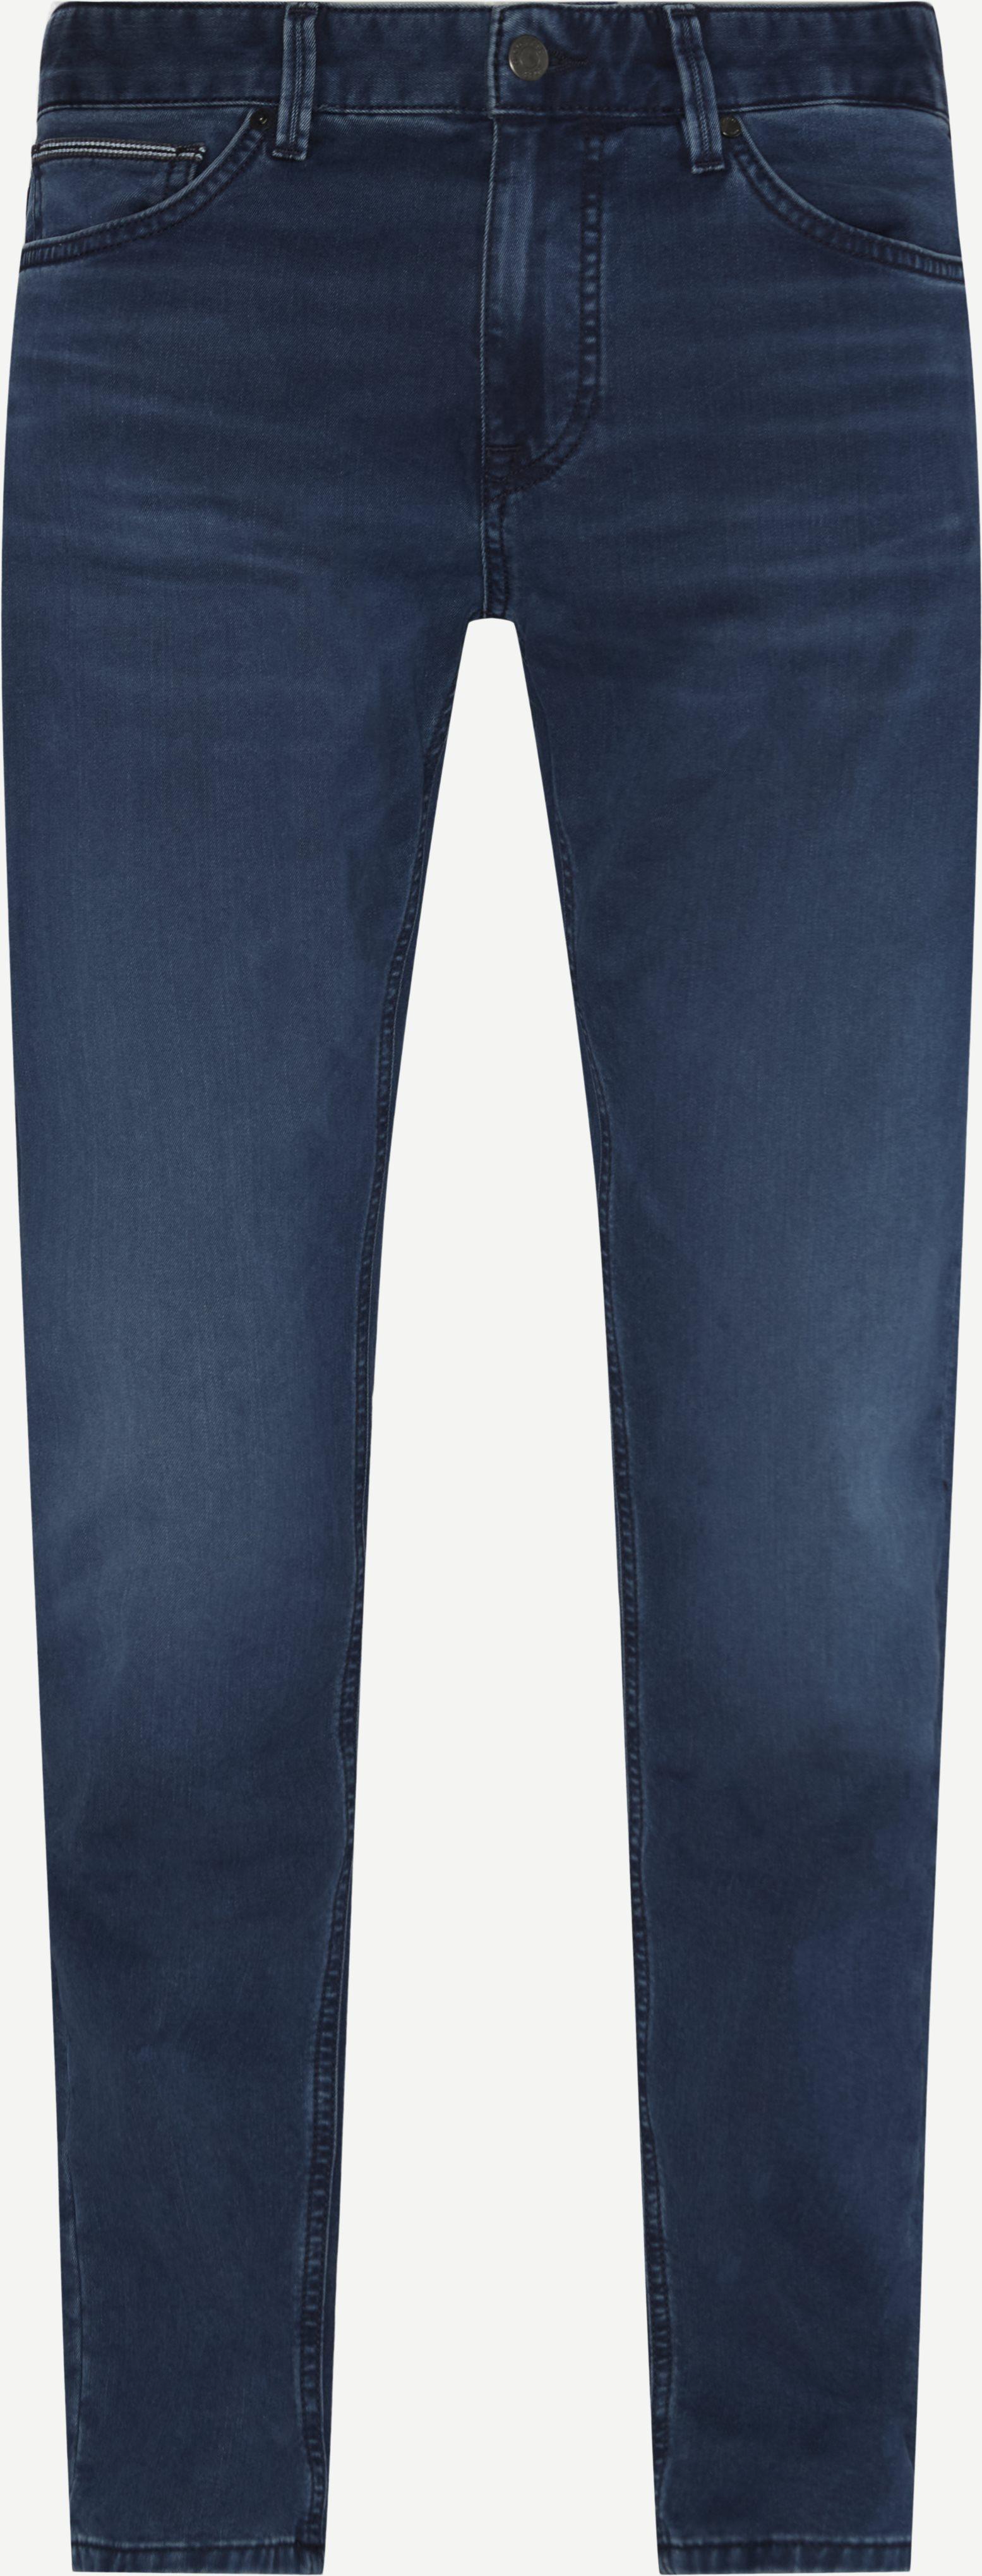 Maine3+ jeans - Jeans - Regular - Denim